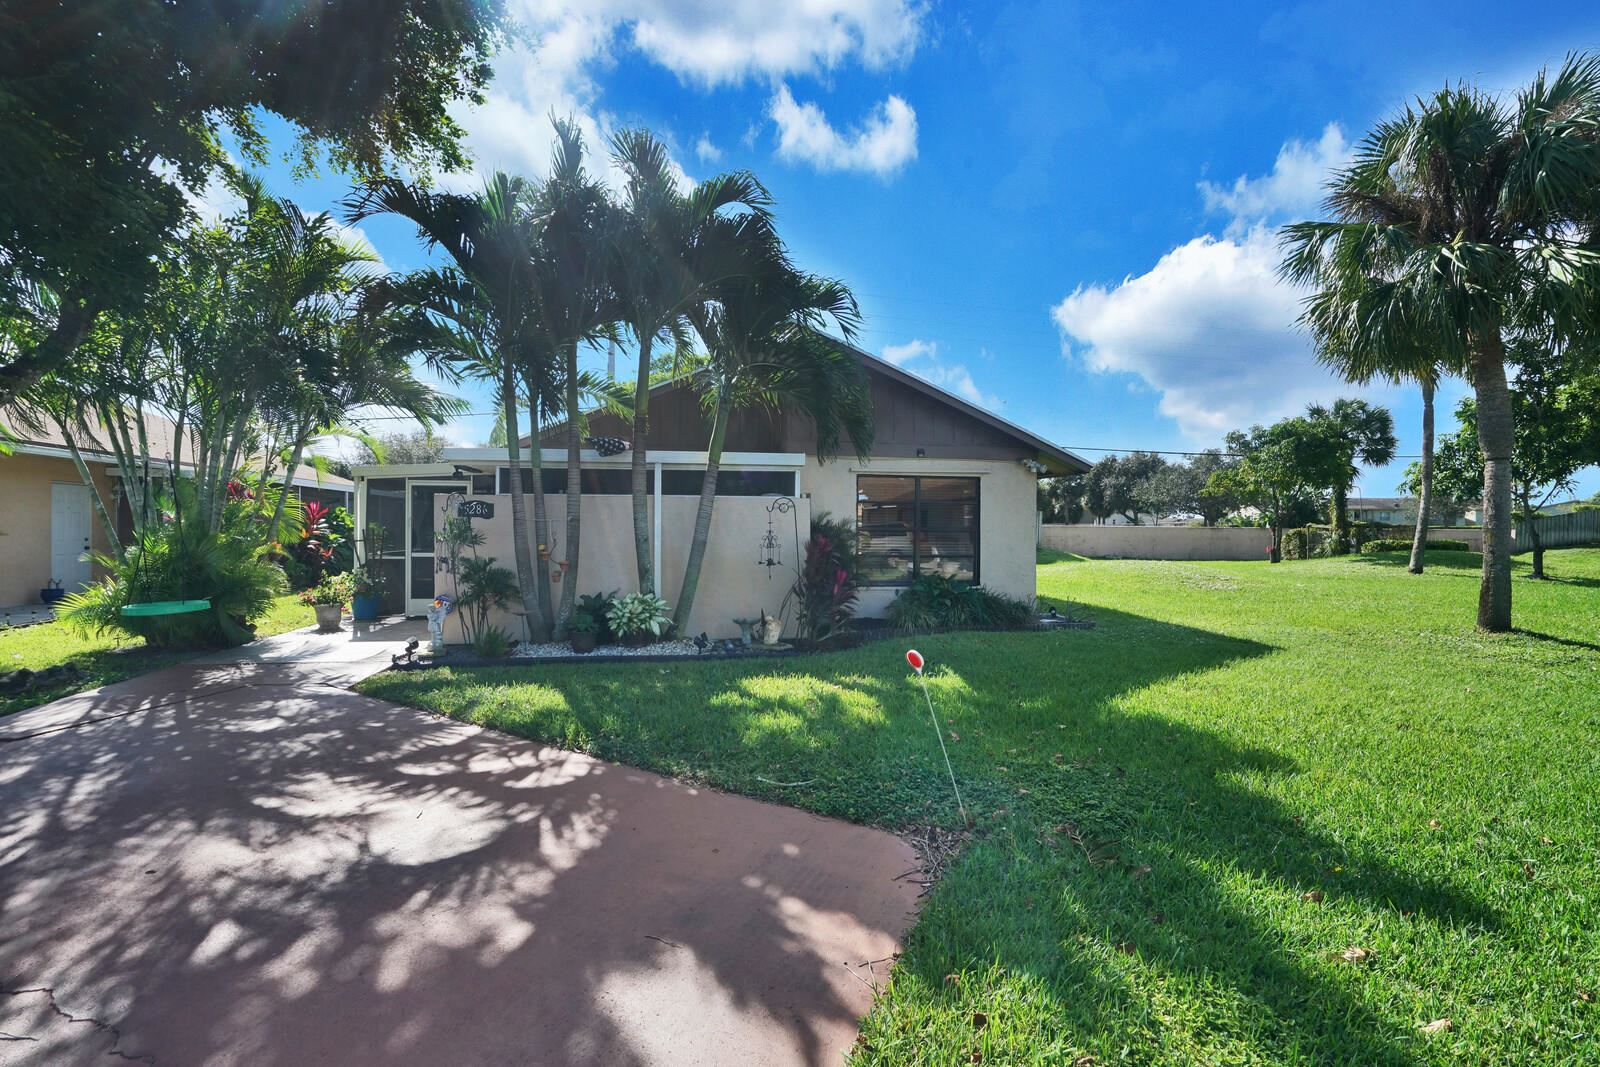 5286 Robbie Court, West Palm Beach, FL 33415 - #: RX-10674252